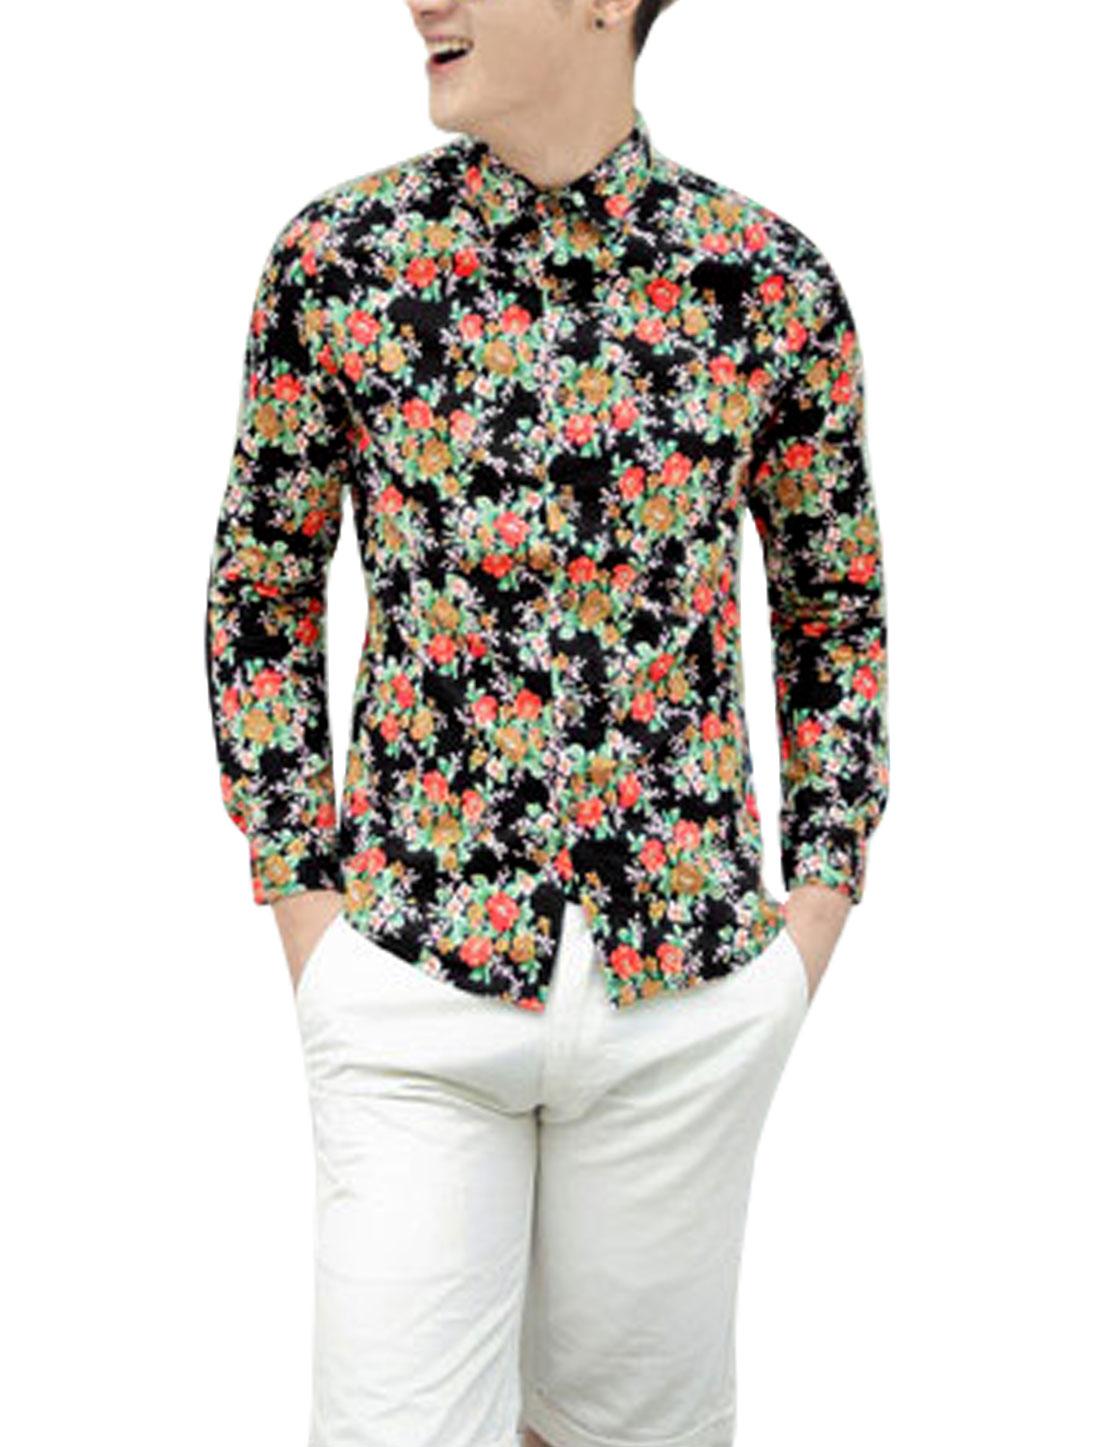 Men Long Sleeves Allover Flower Print Single Breasted Slim Cut Shirt Black Orange S